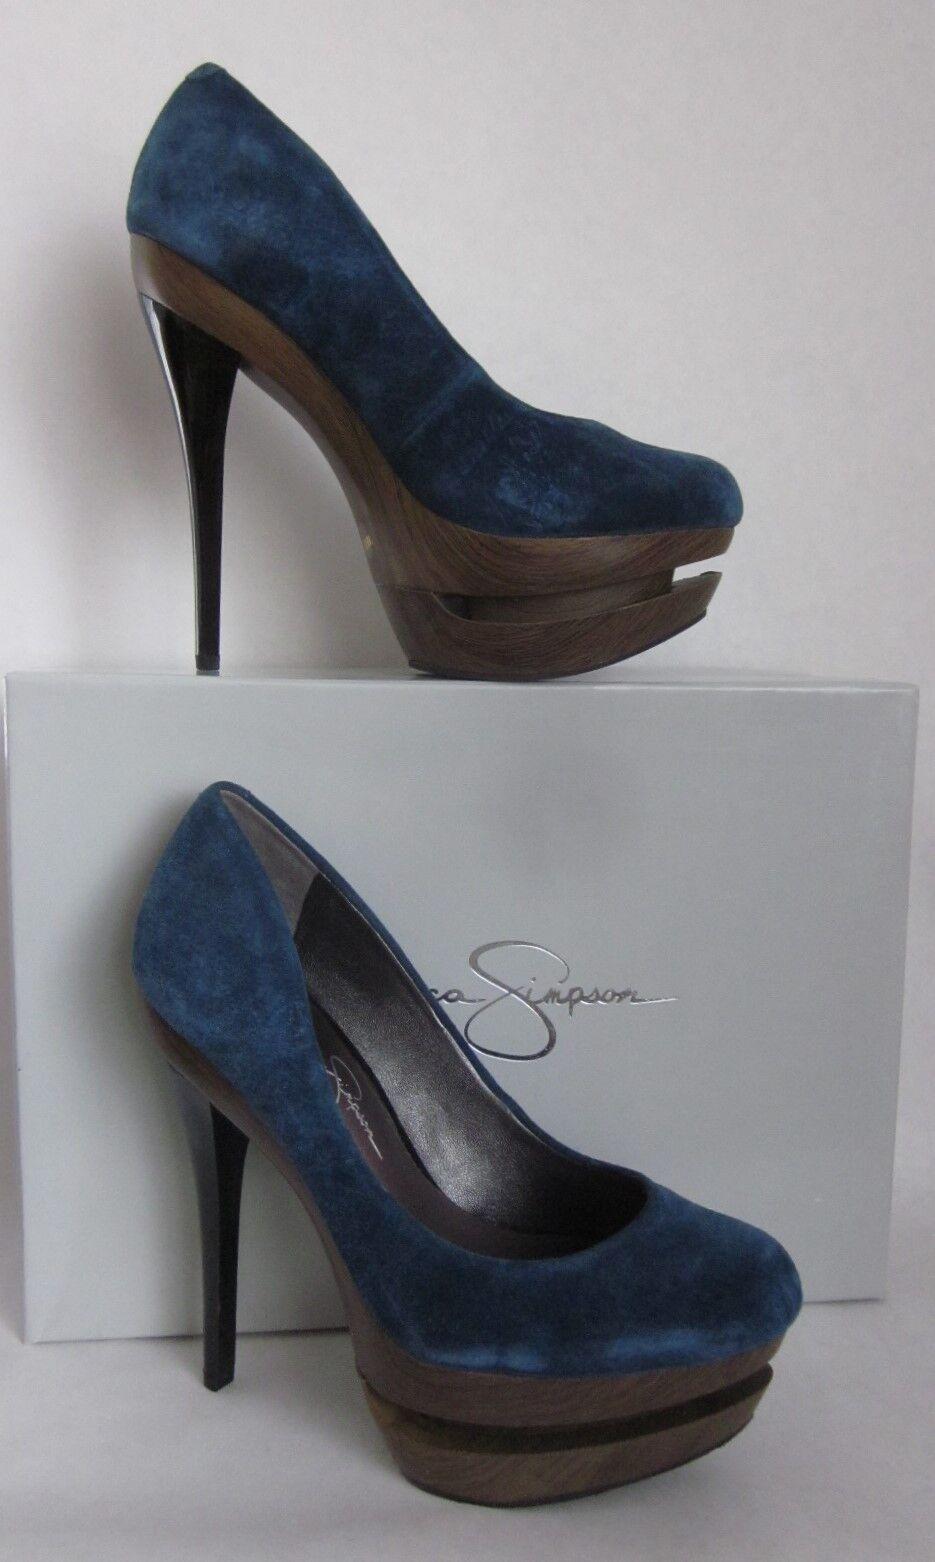 Jessica Simpson Colie blu Nubuck Platform Heel -  Dimensione 6  buon prezzo